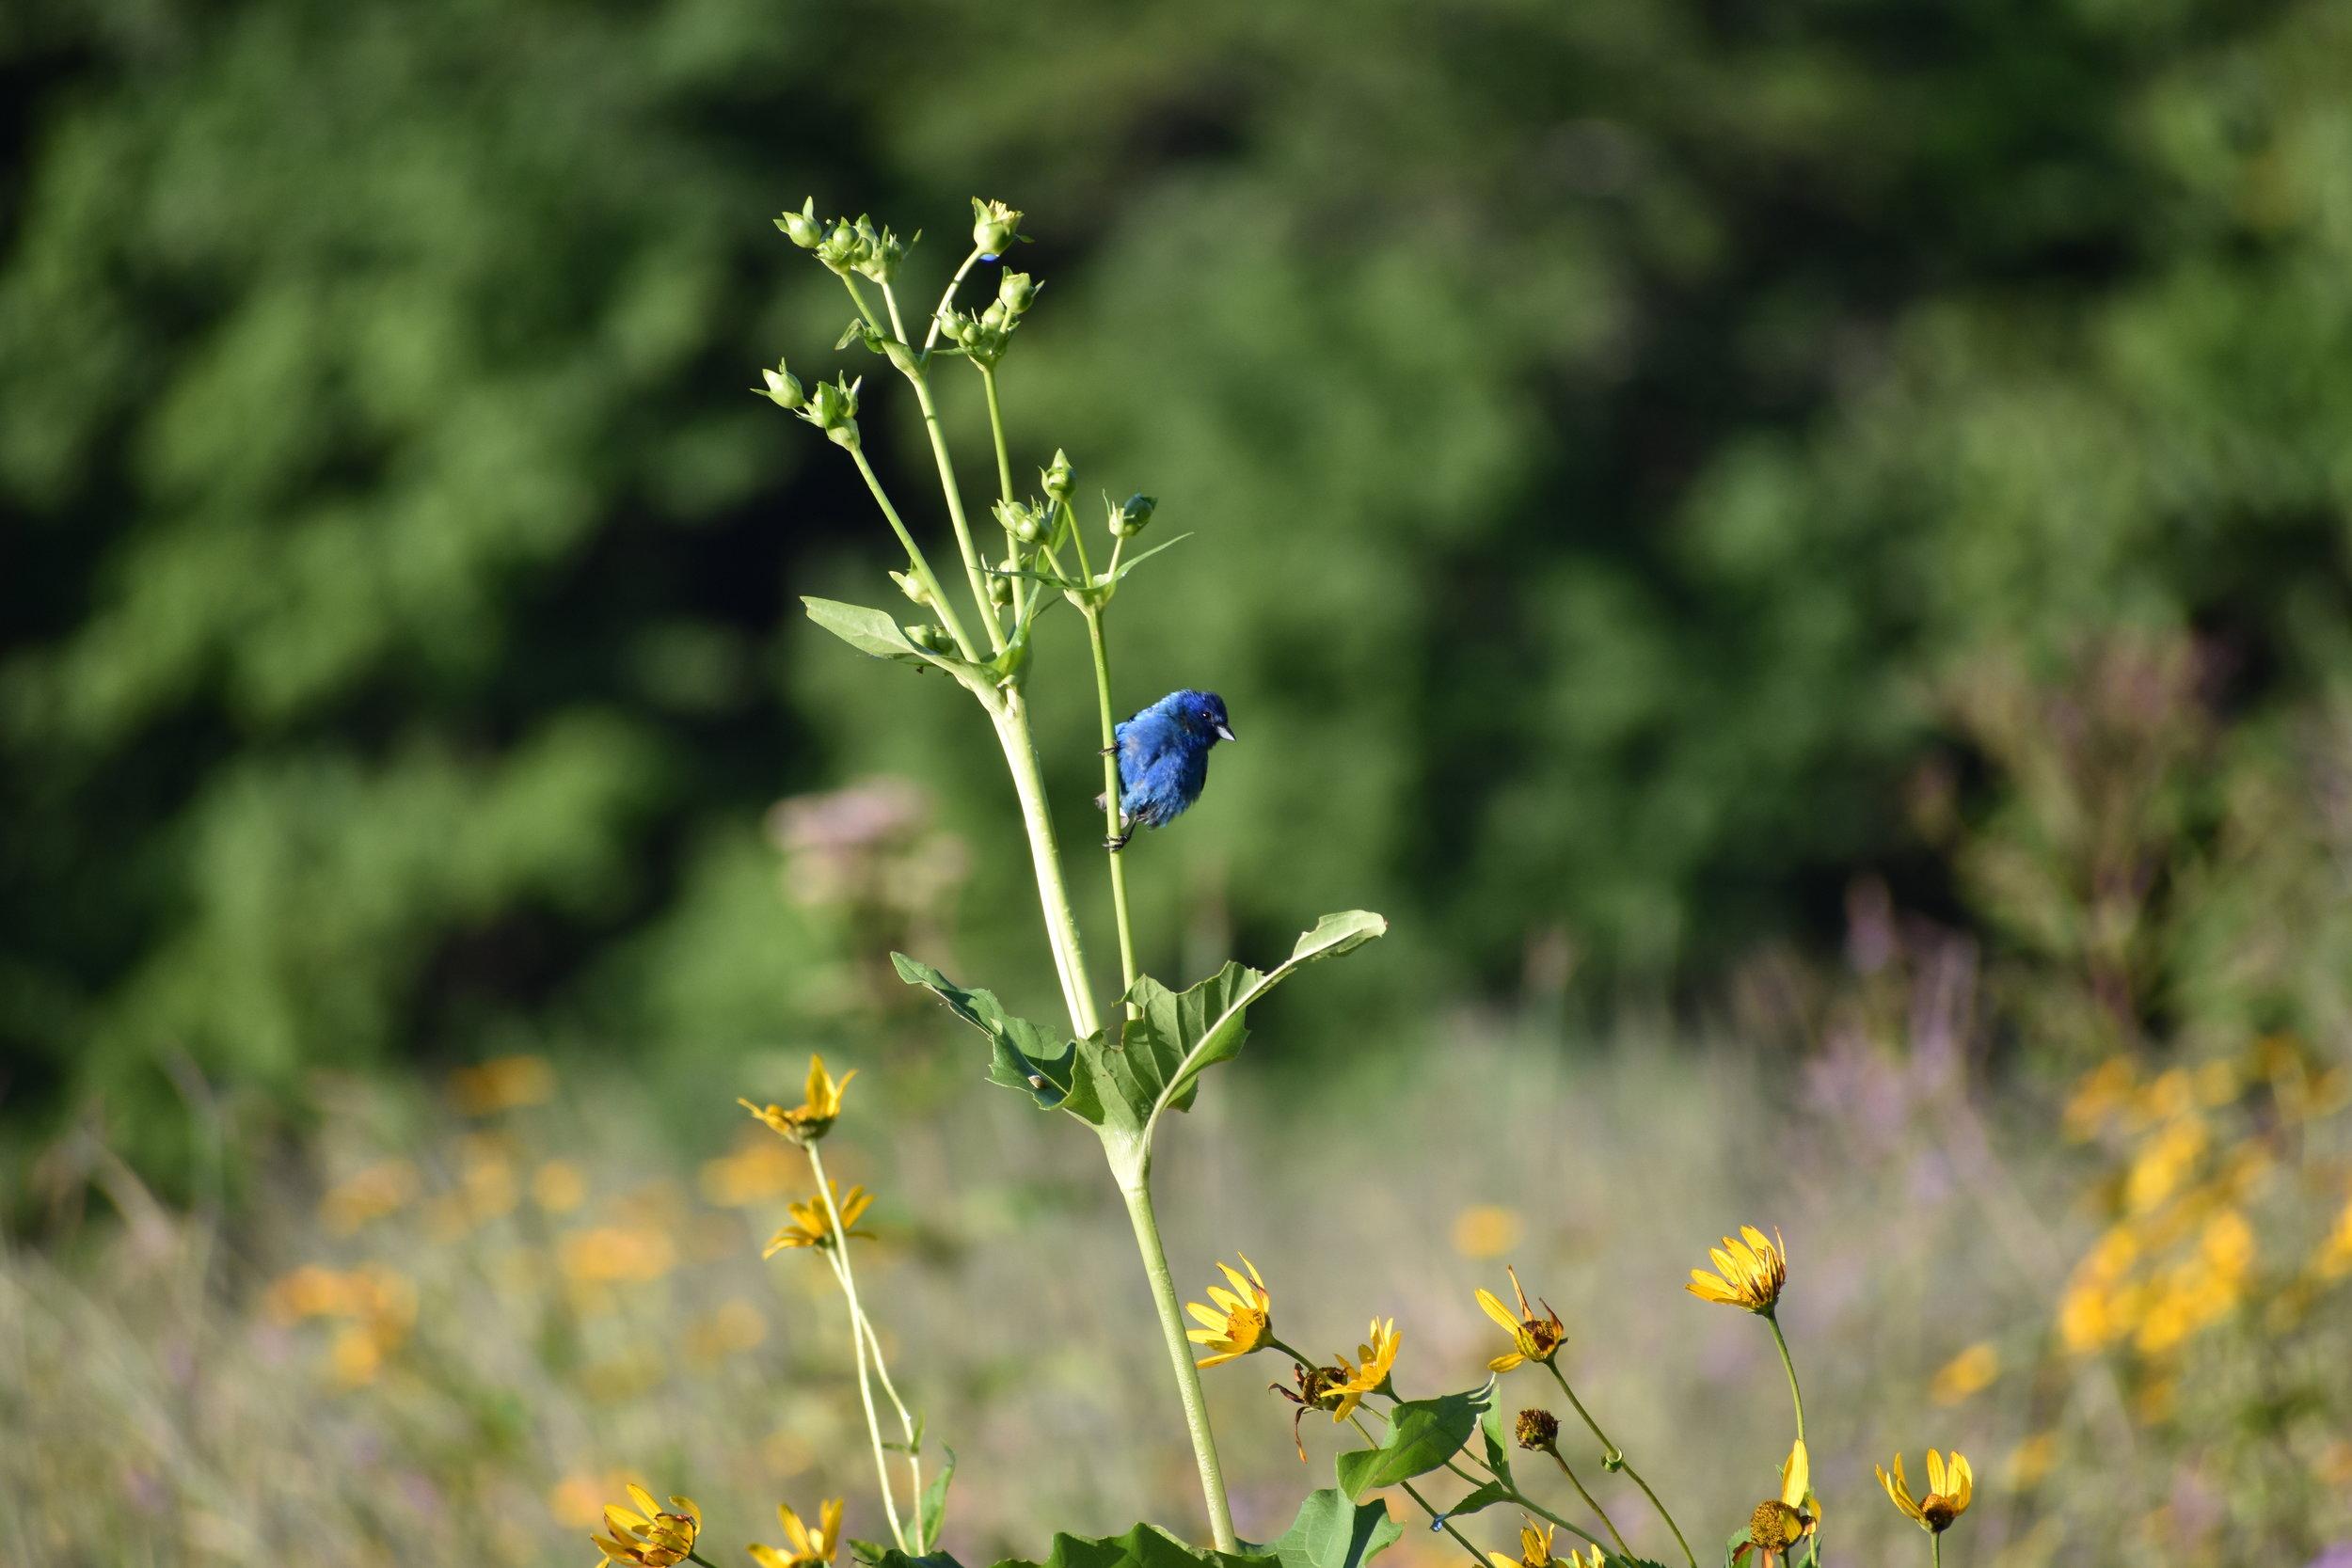 Indigo Bunting on Sunflower stalk